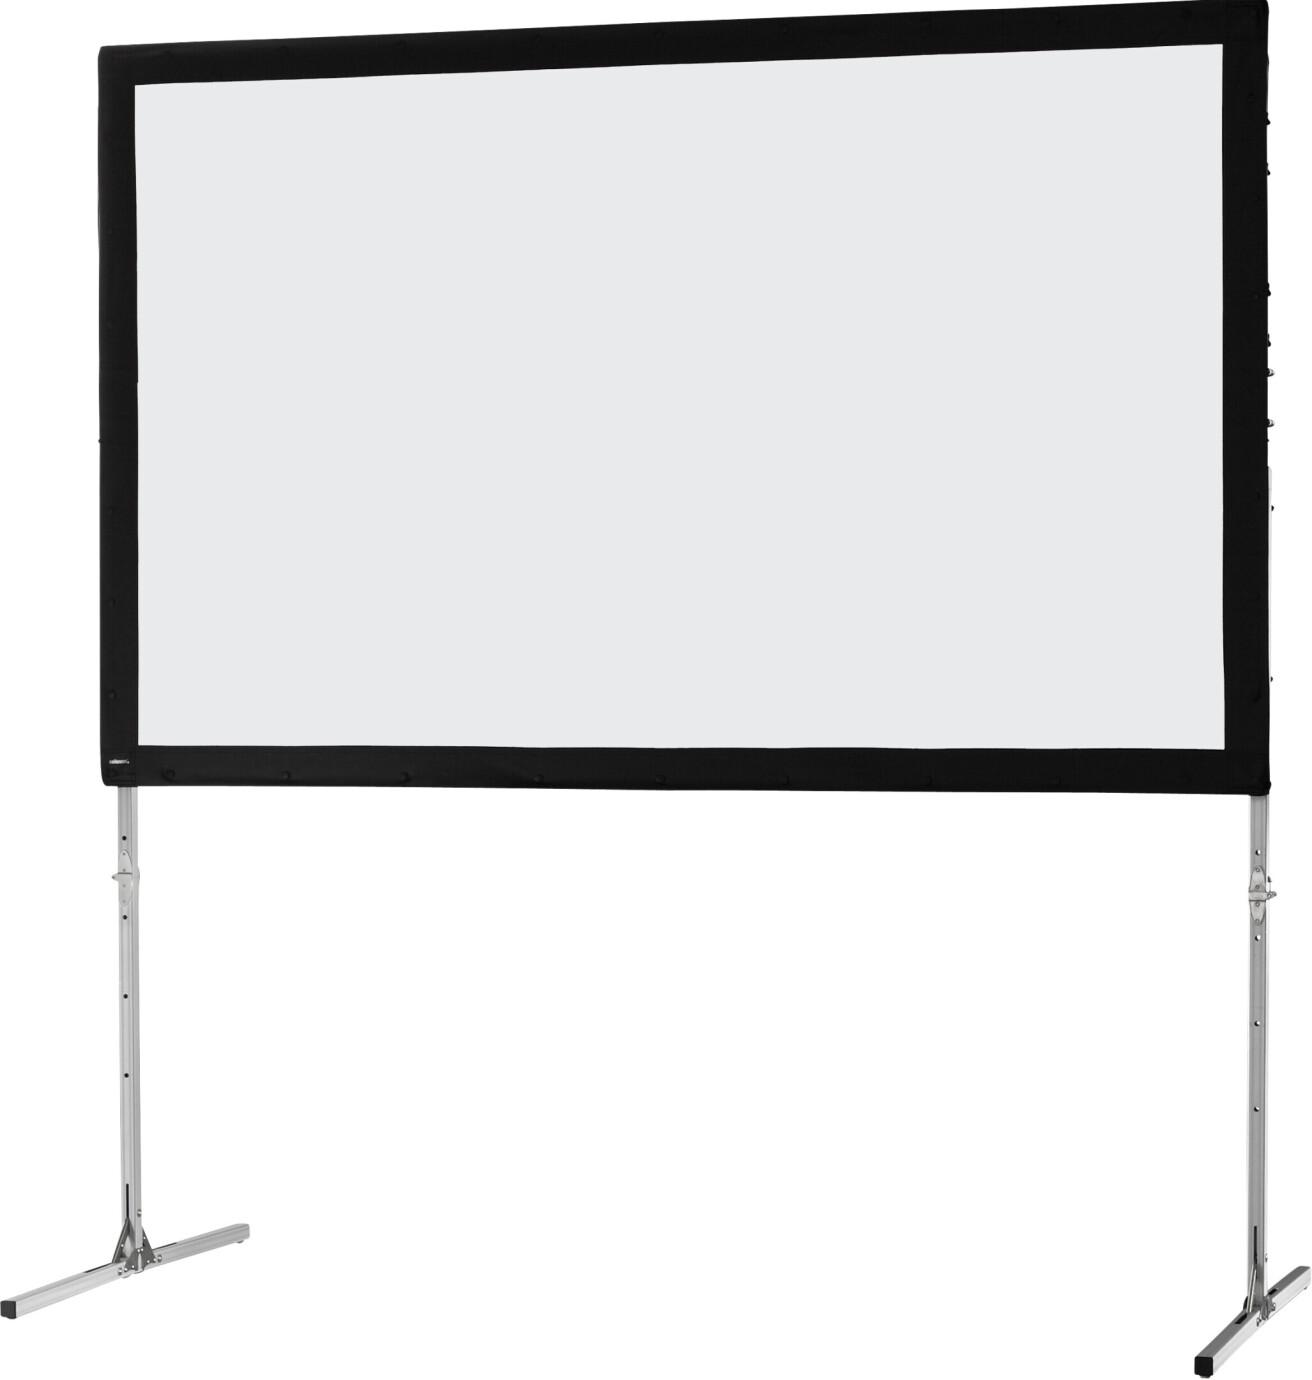 celexon Faltrahmen Leinwand Mobil Expert 366 x 229 cm, Frontprojektion